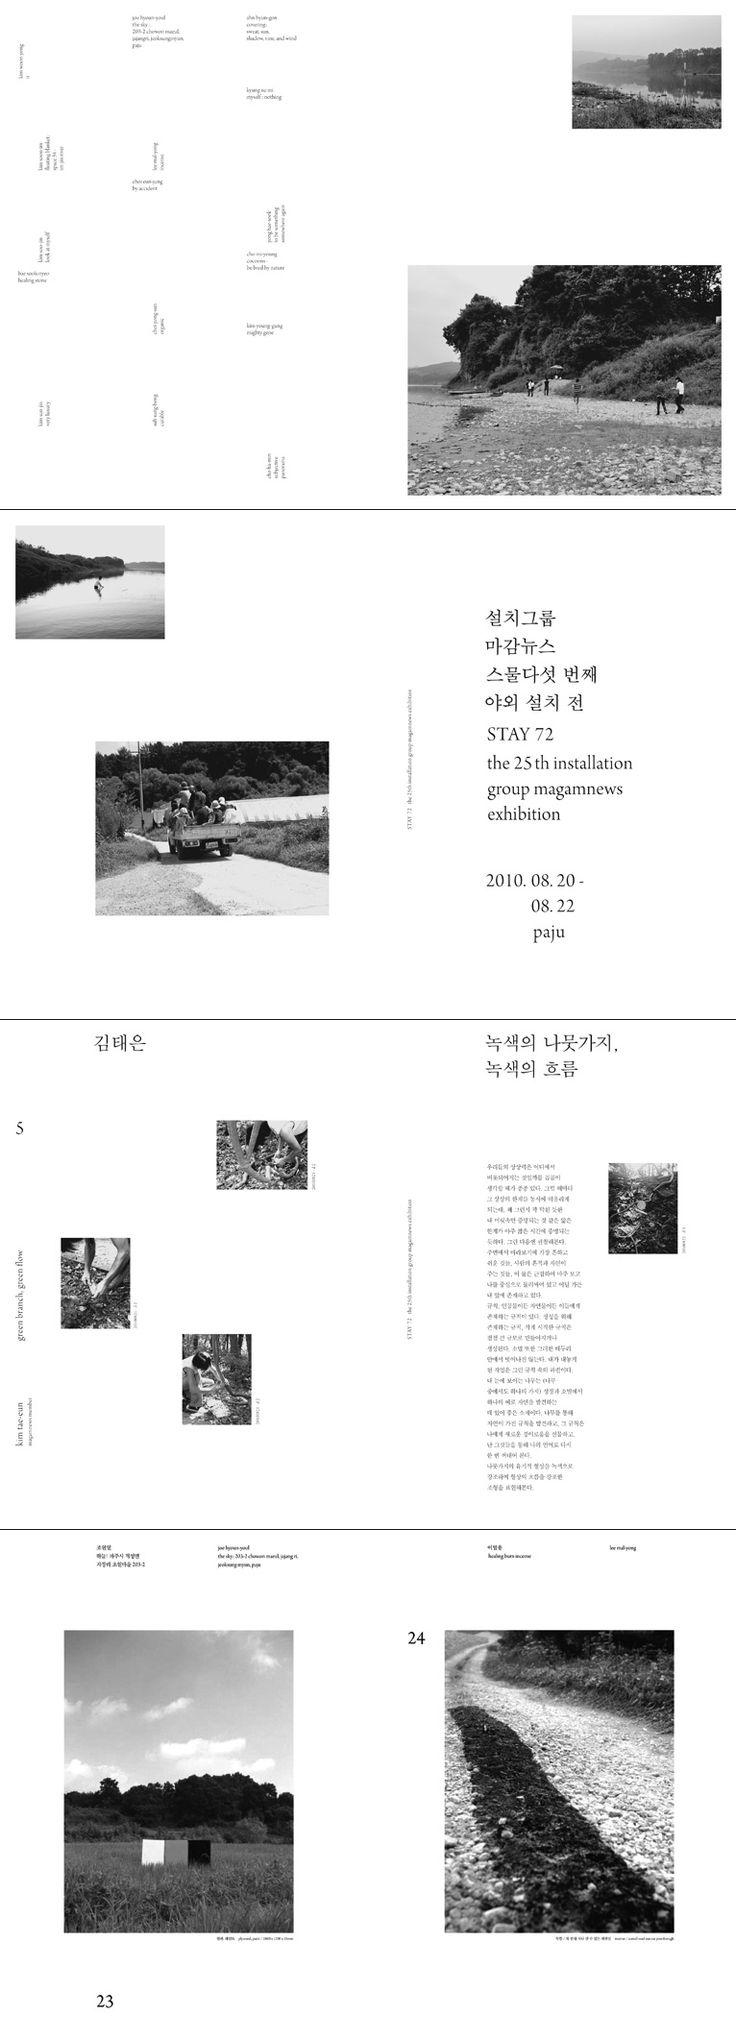 http://www.fontclub.co.kr/Typoworks/work/work_view.asp?page=14